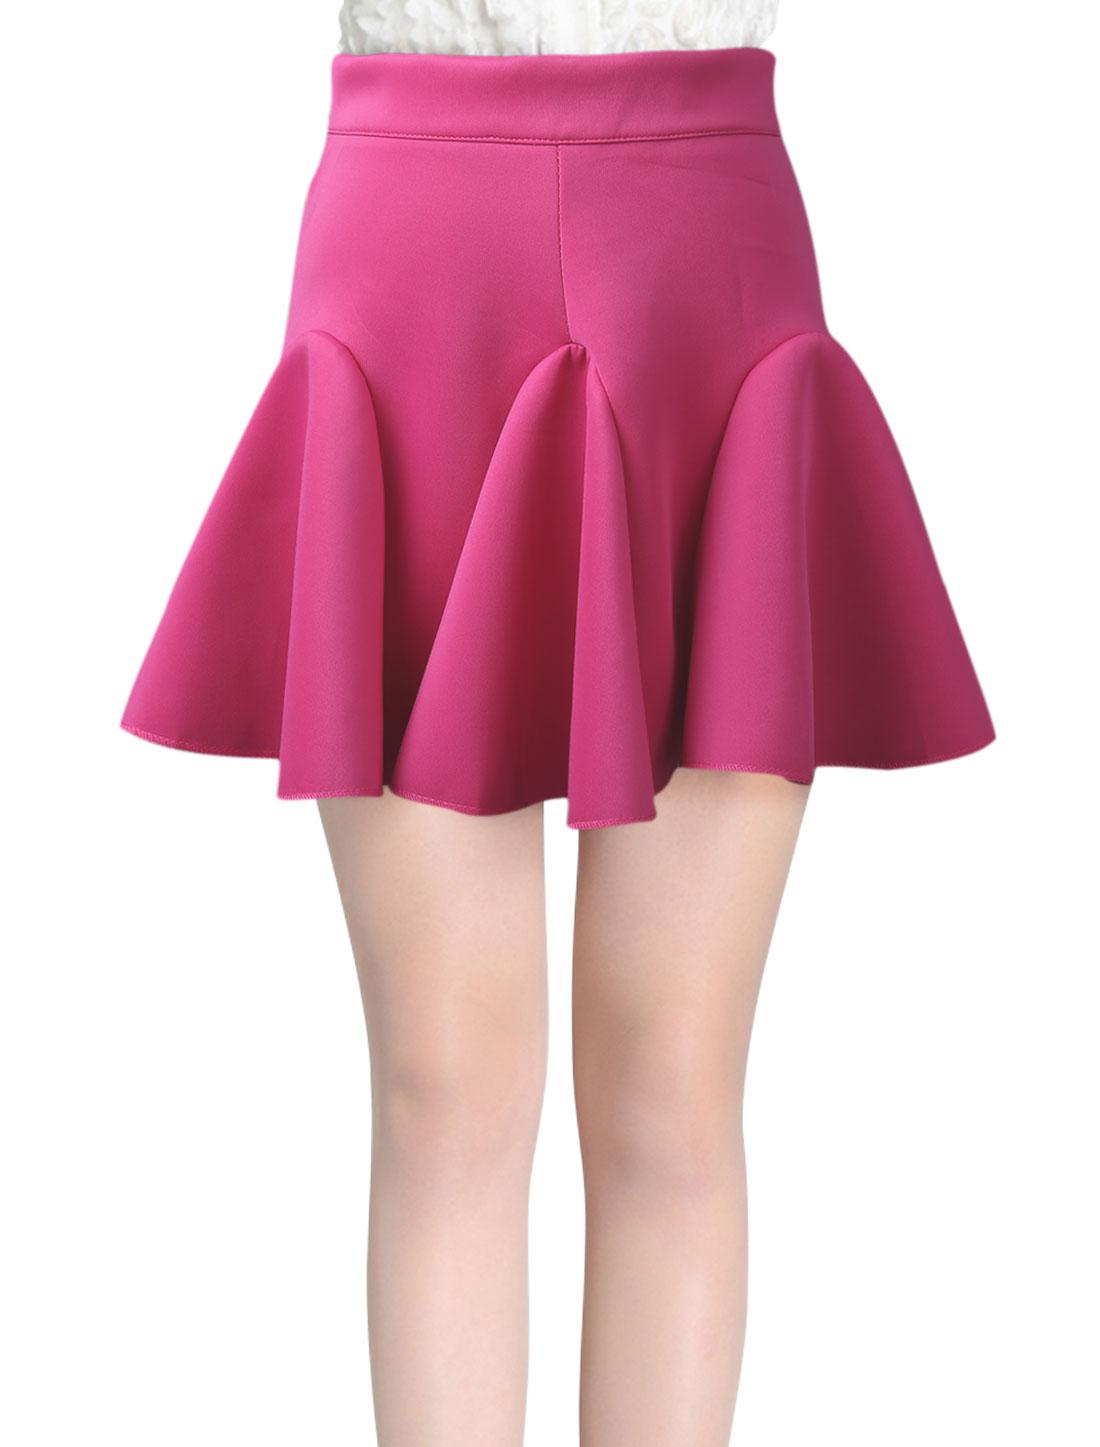 Women High Waist Ruffled Hem Casual Fit and Flare Skirt Fuchsia L